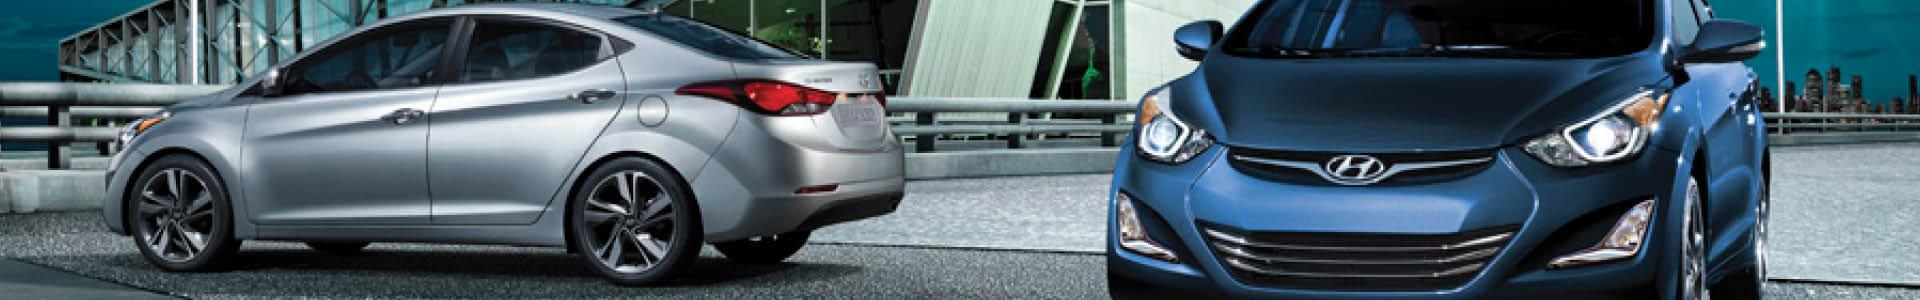 Used Hyundai Elantra for Sale Calgary